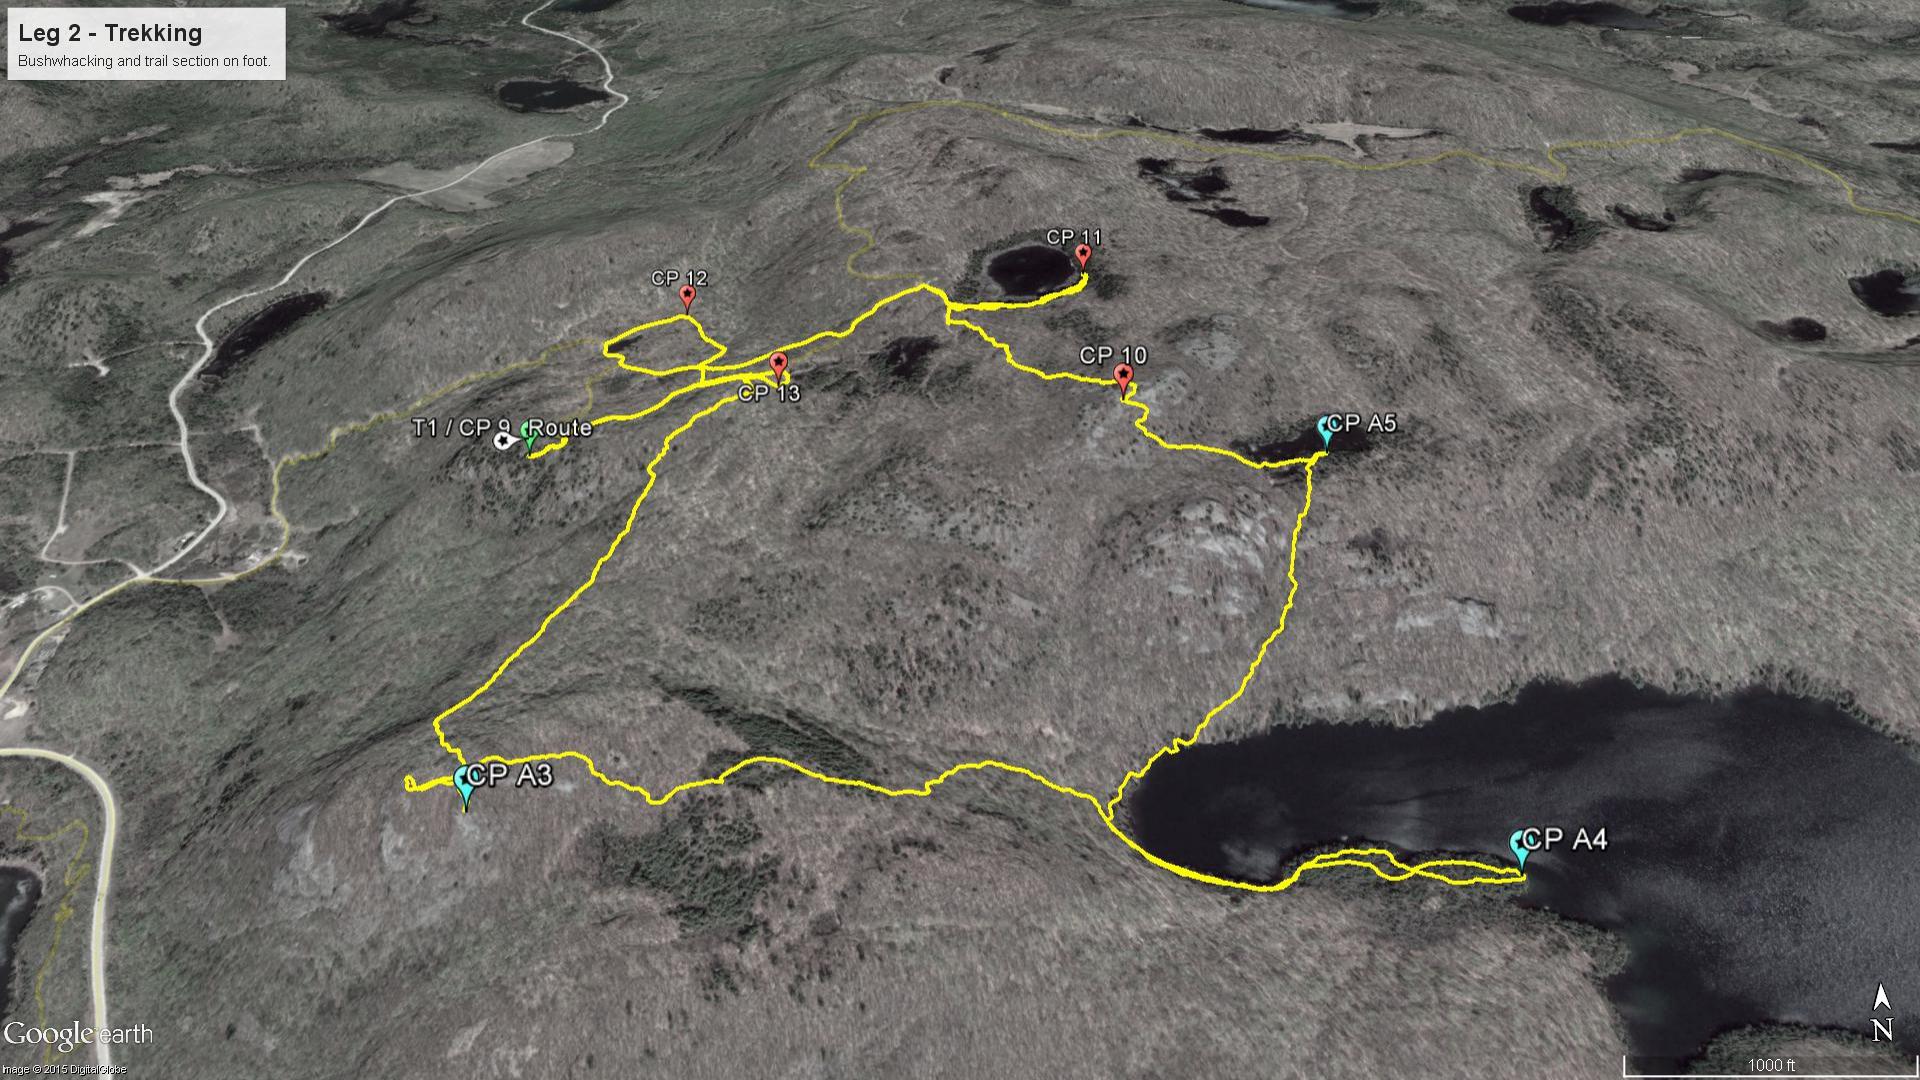 Leg 2 - Trekking